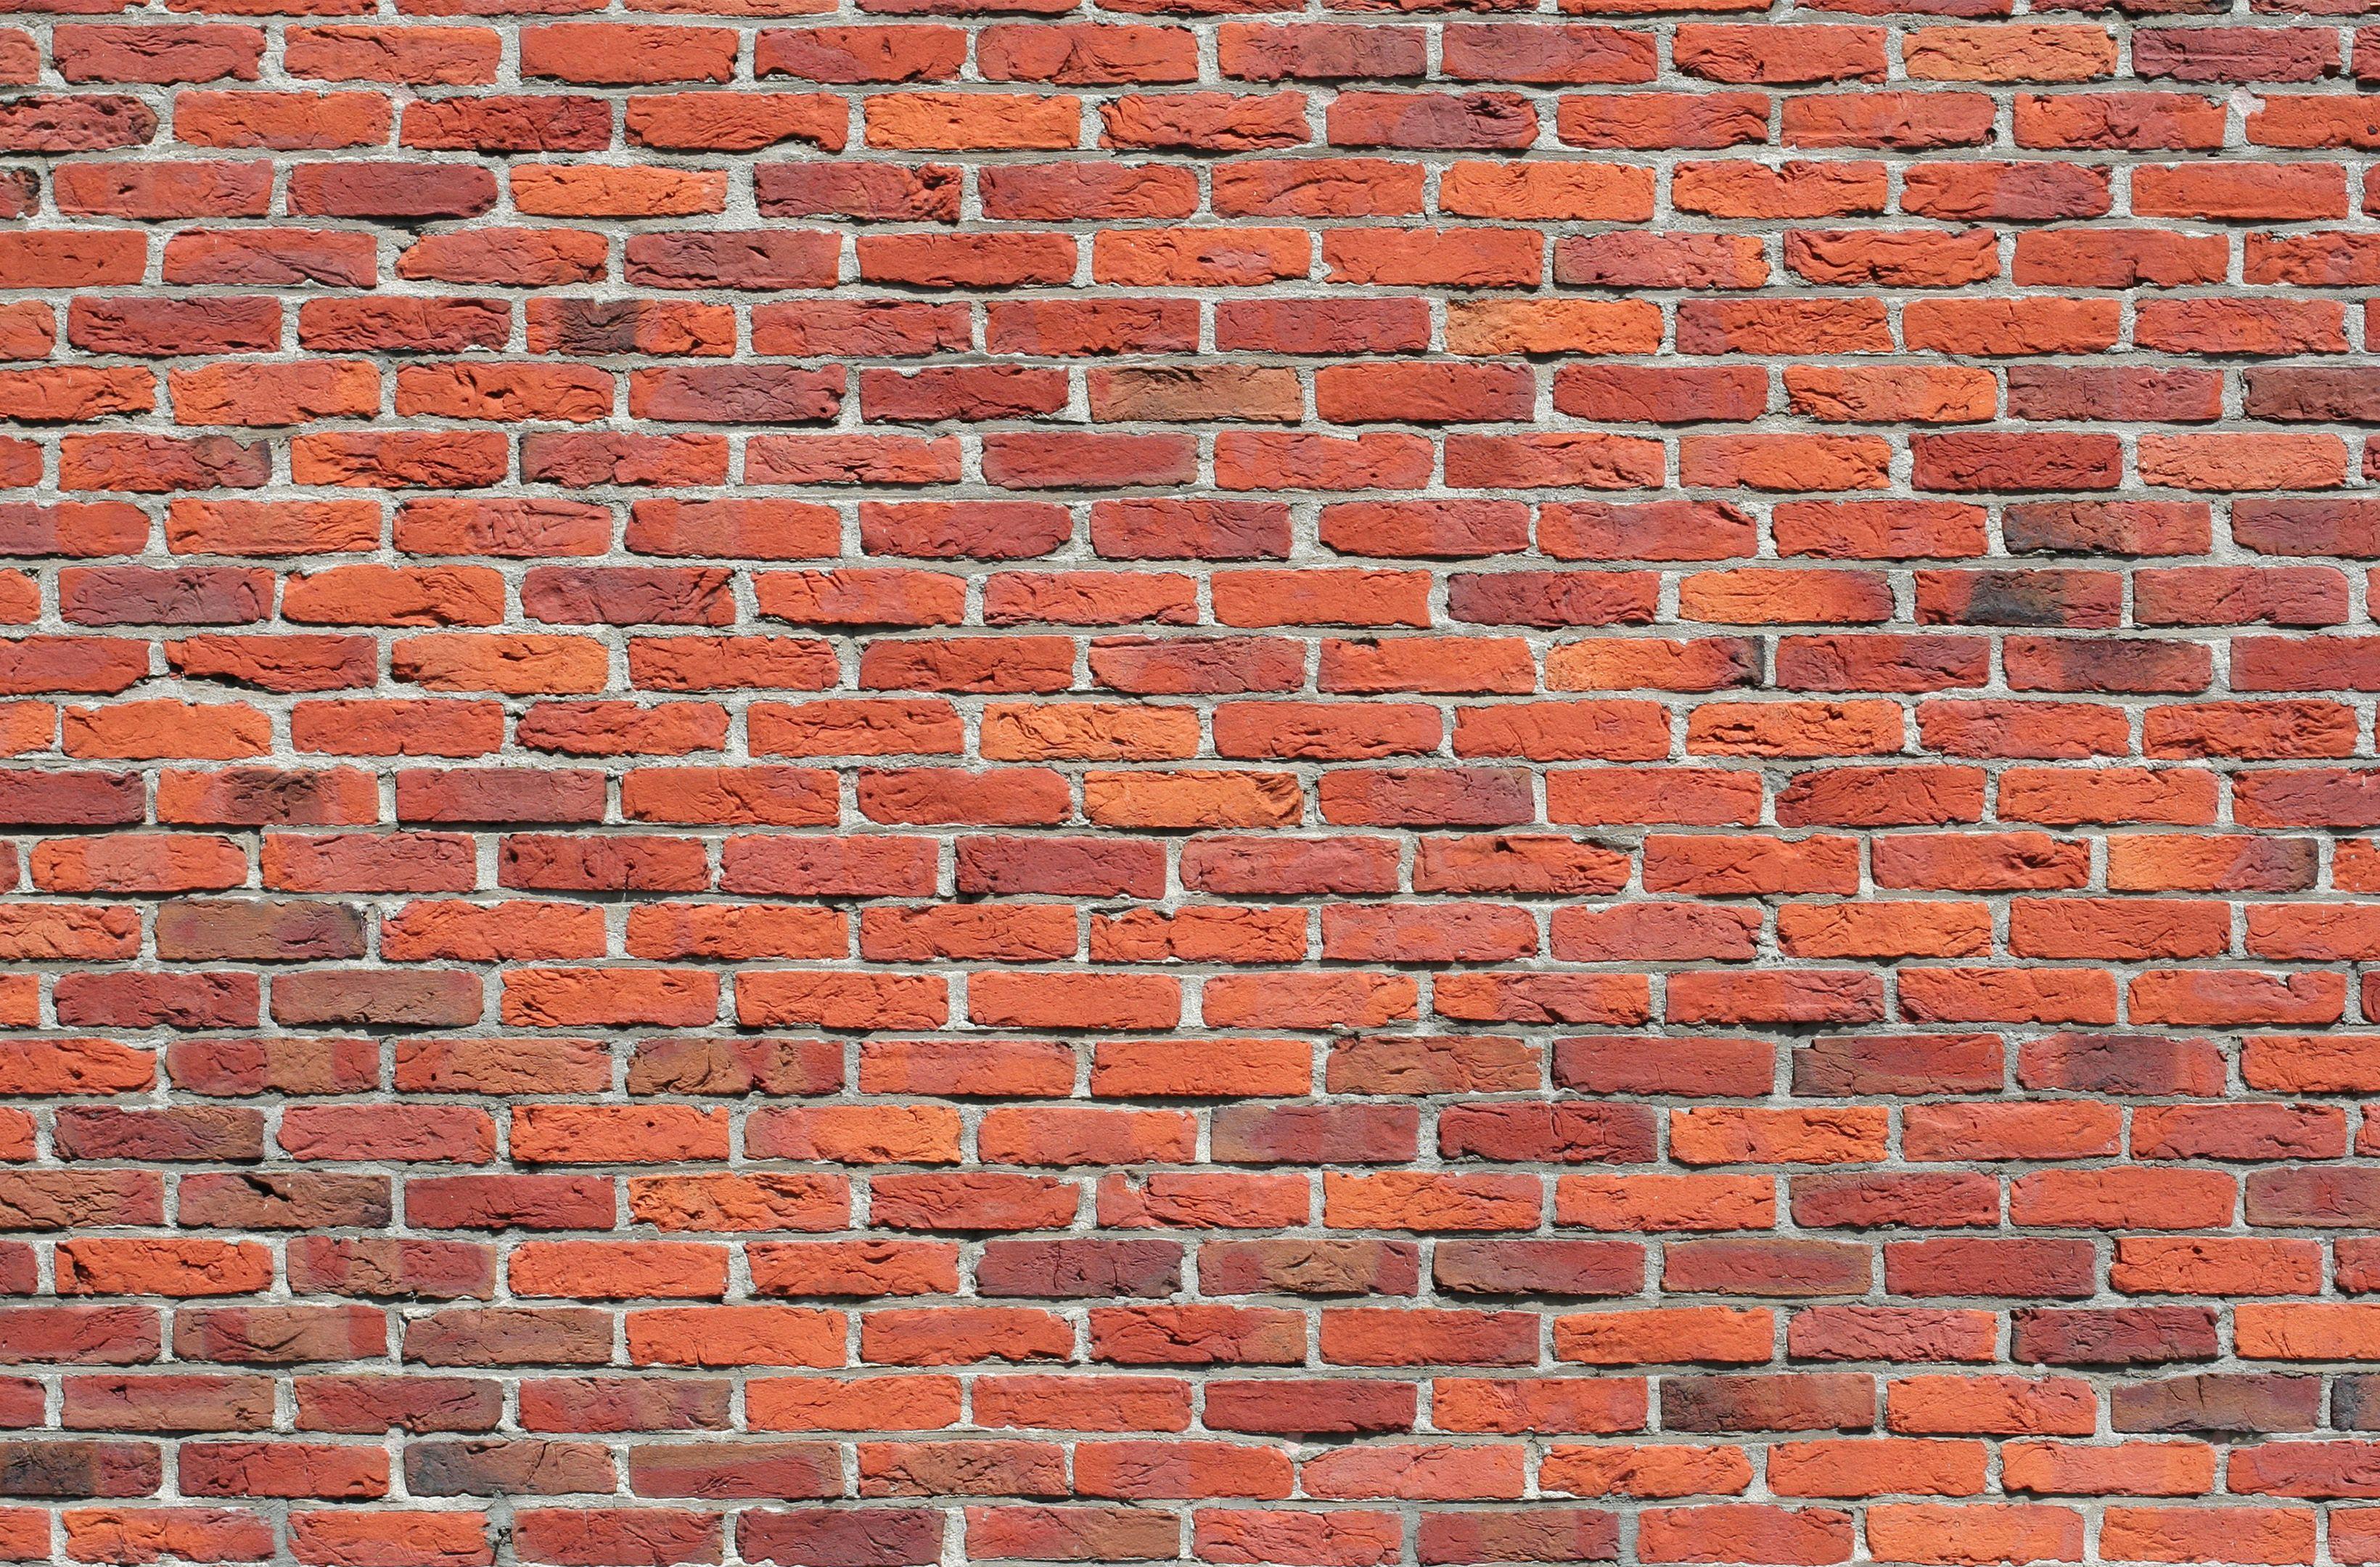 brick wall Texture, download photo, image, bricks, brick masonry, bricks wall background texture ...